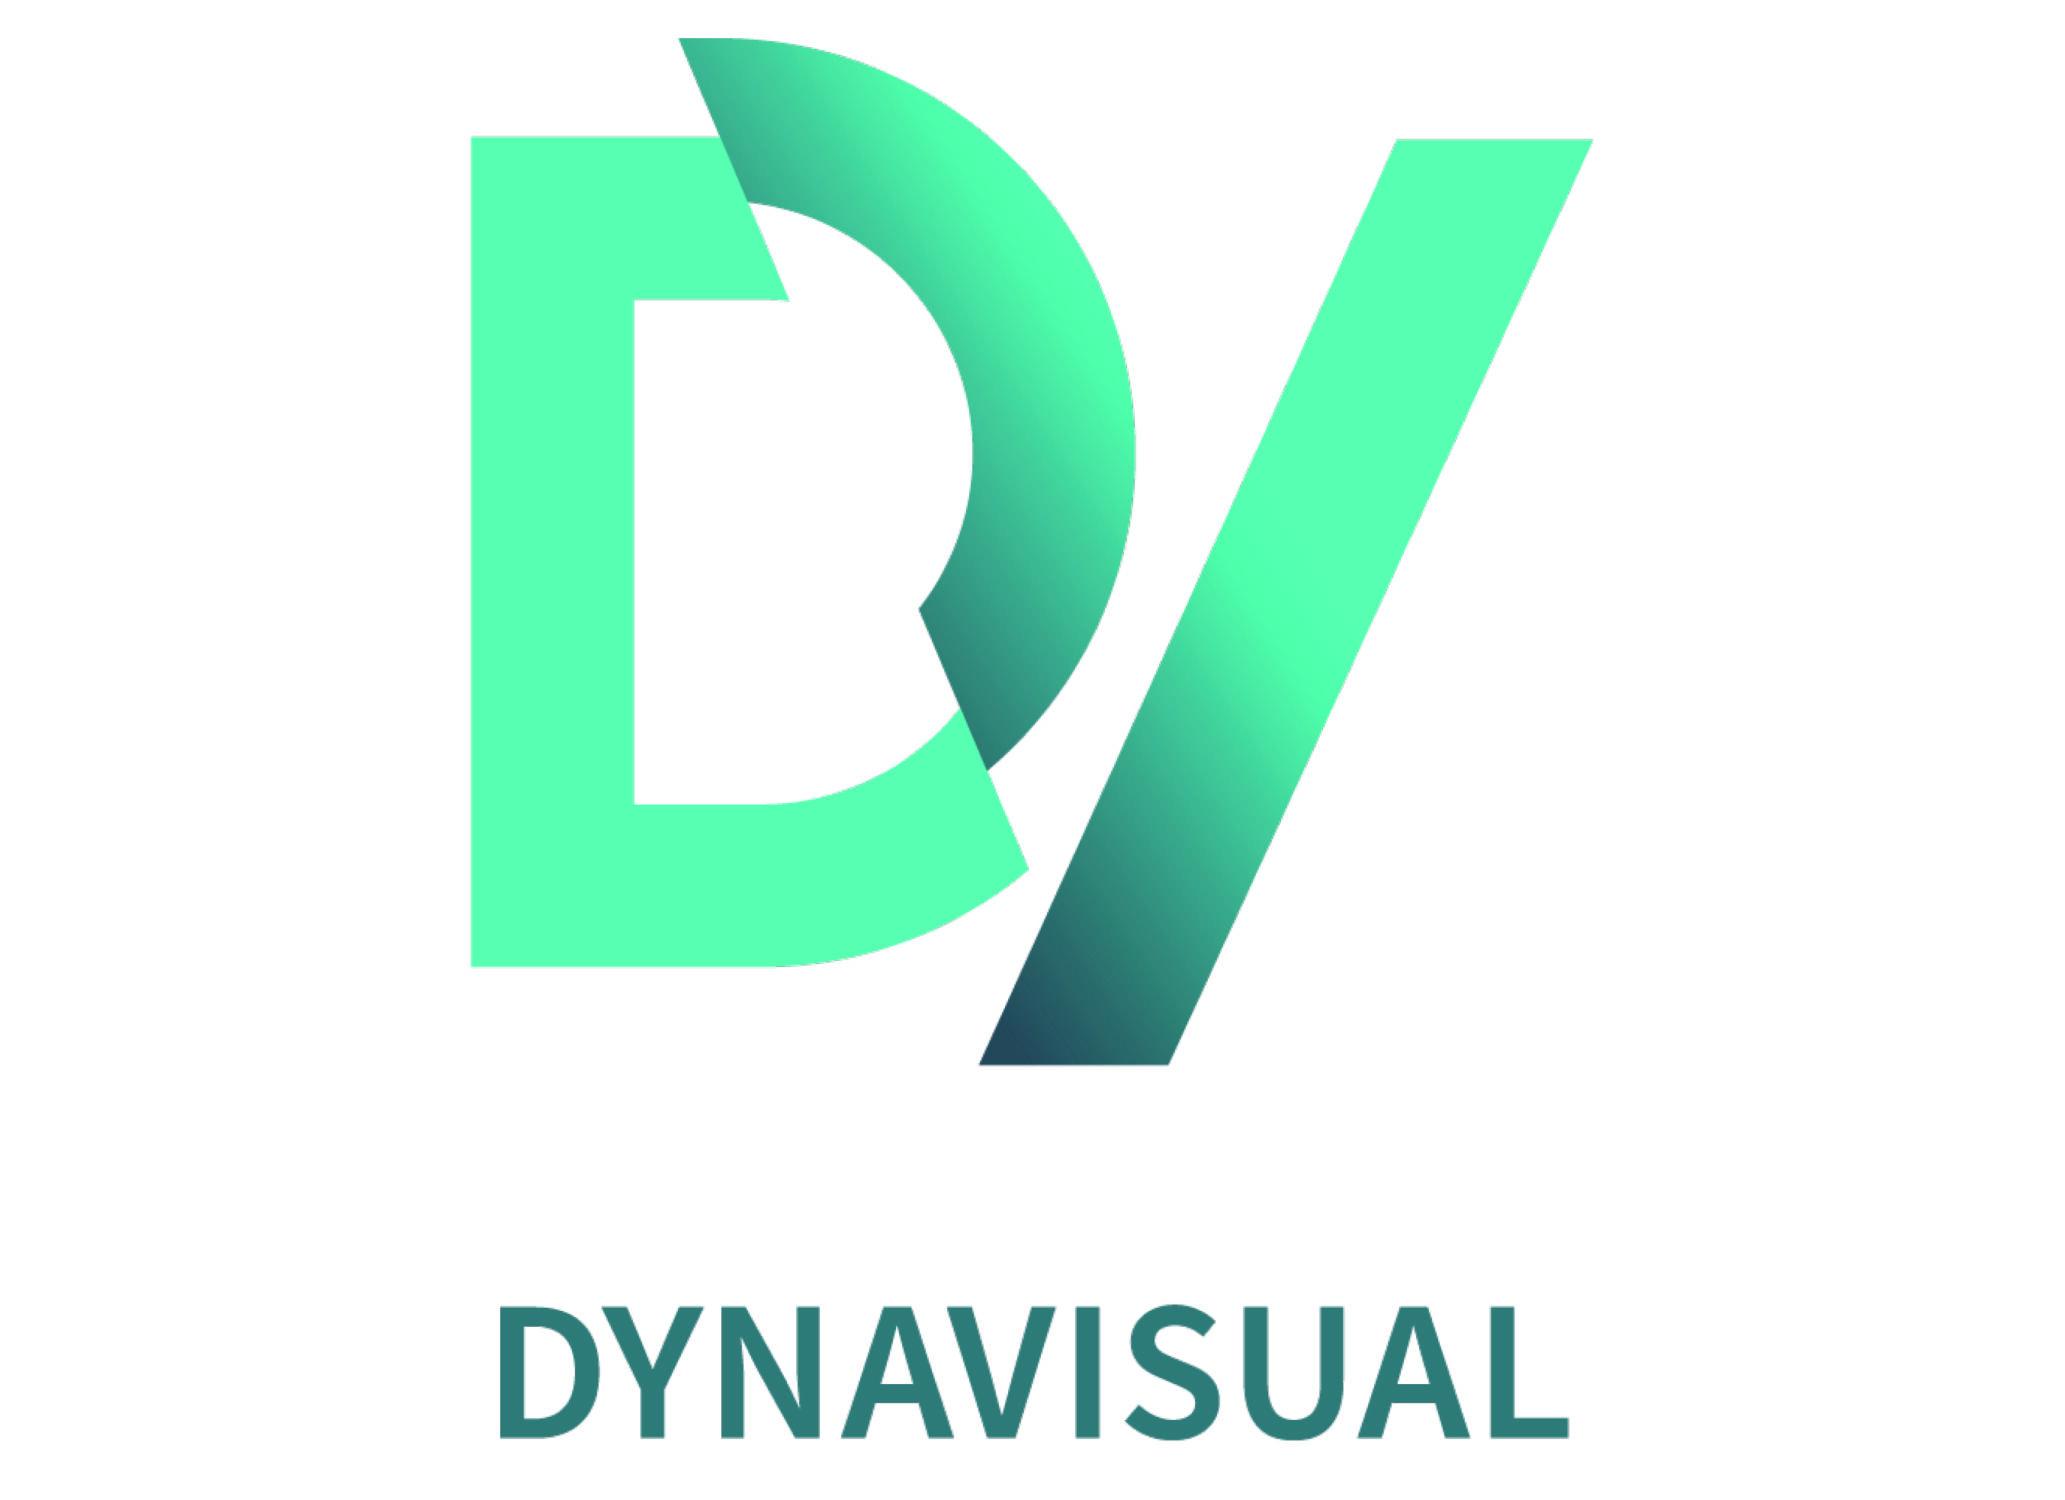 Dynavisual